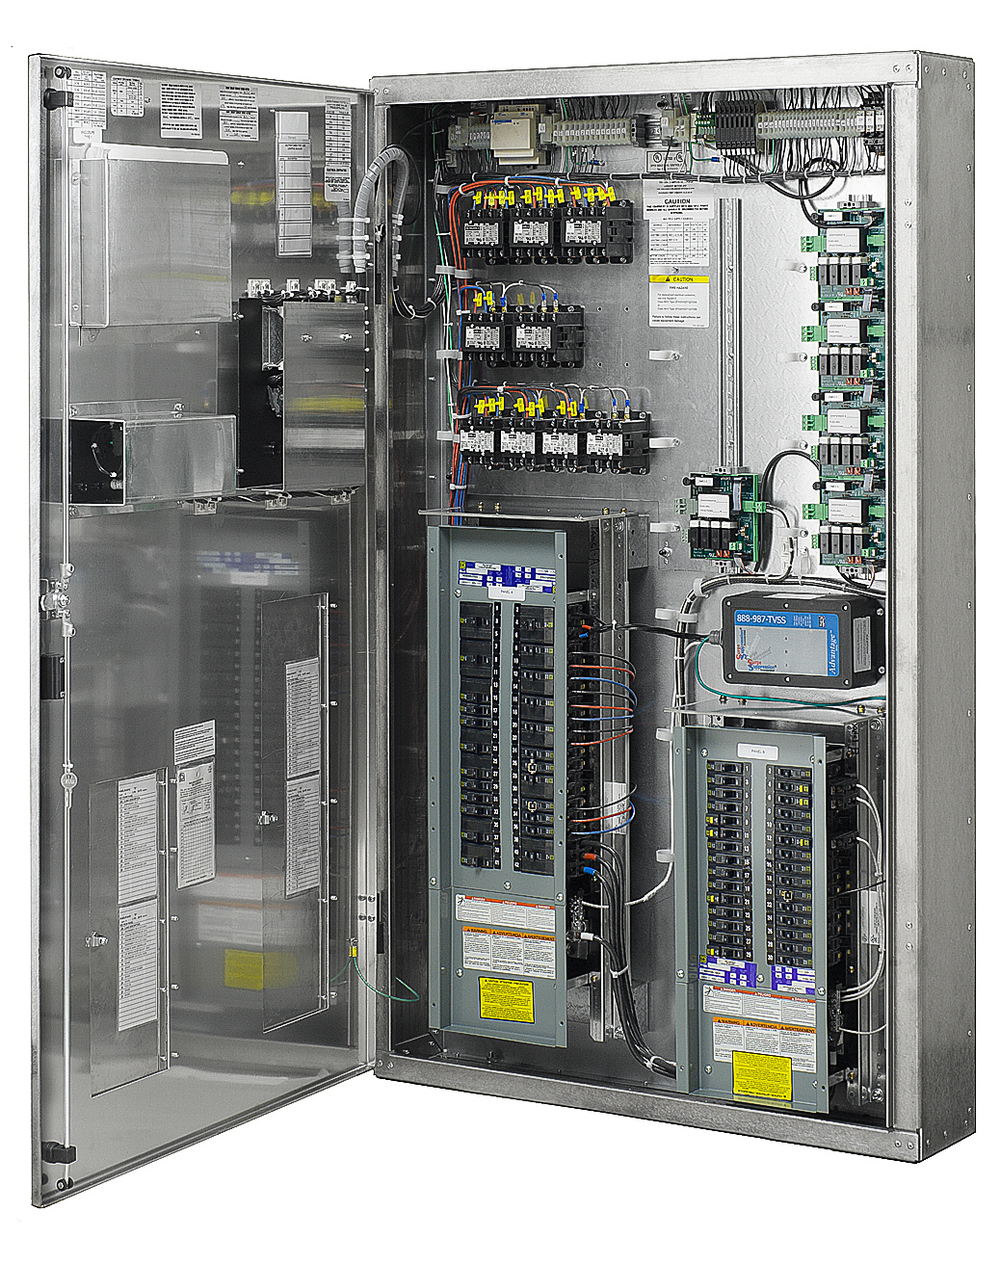 OSM-2767.jpg